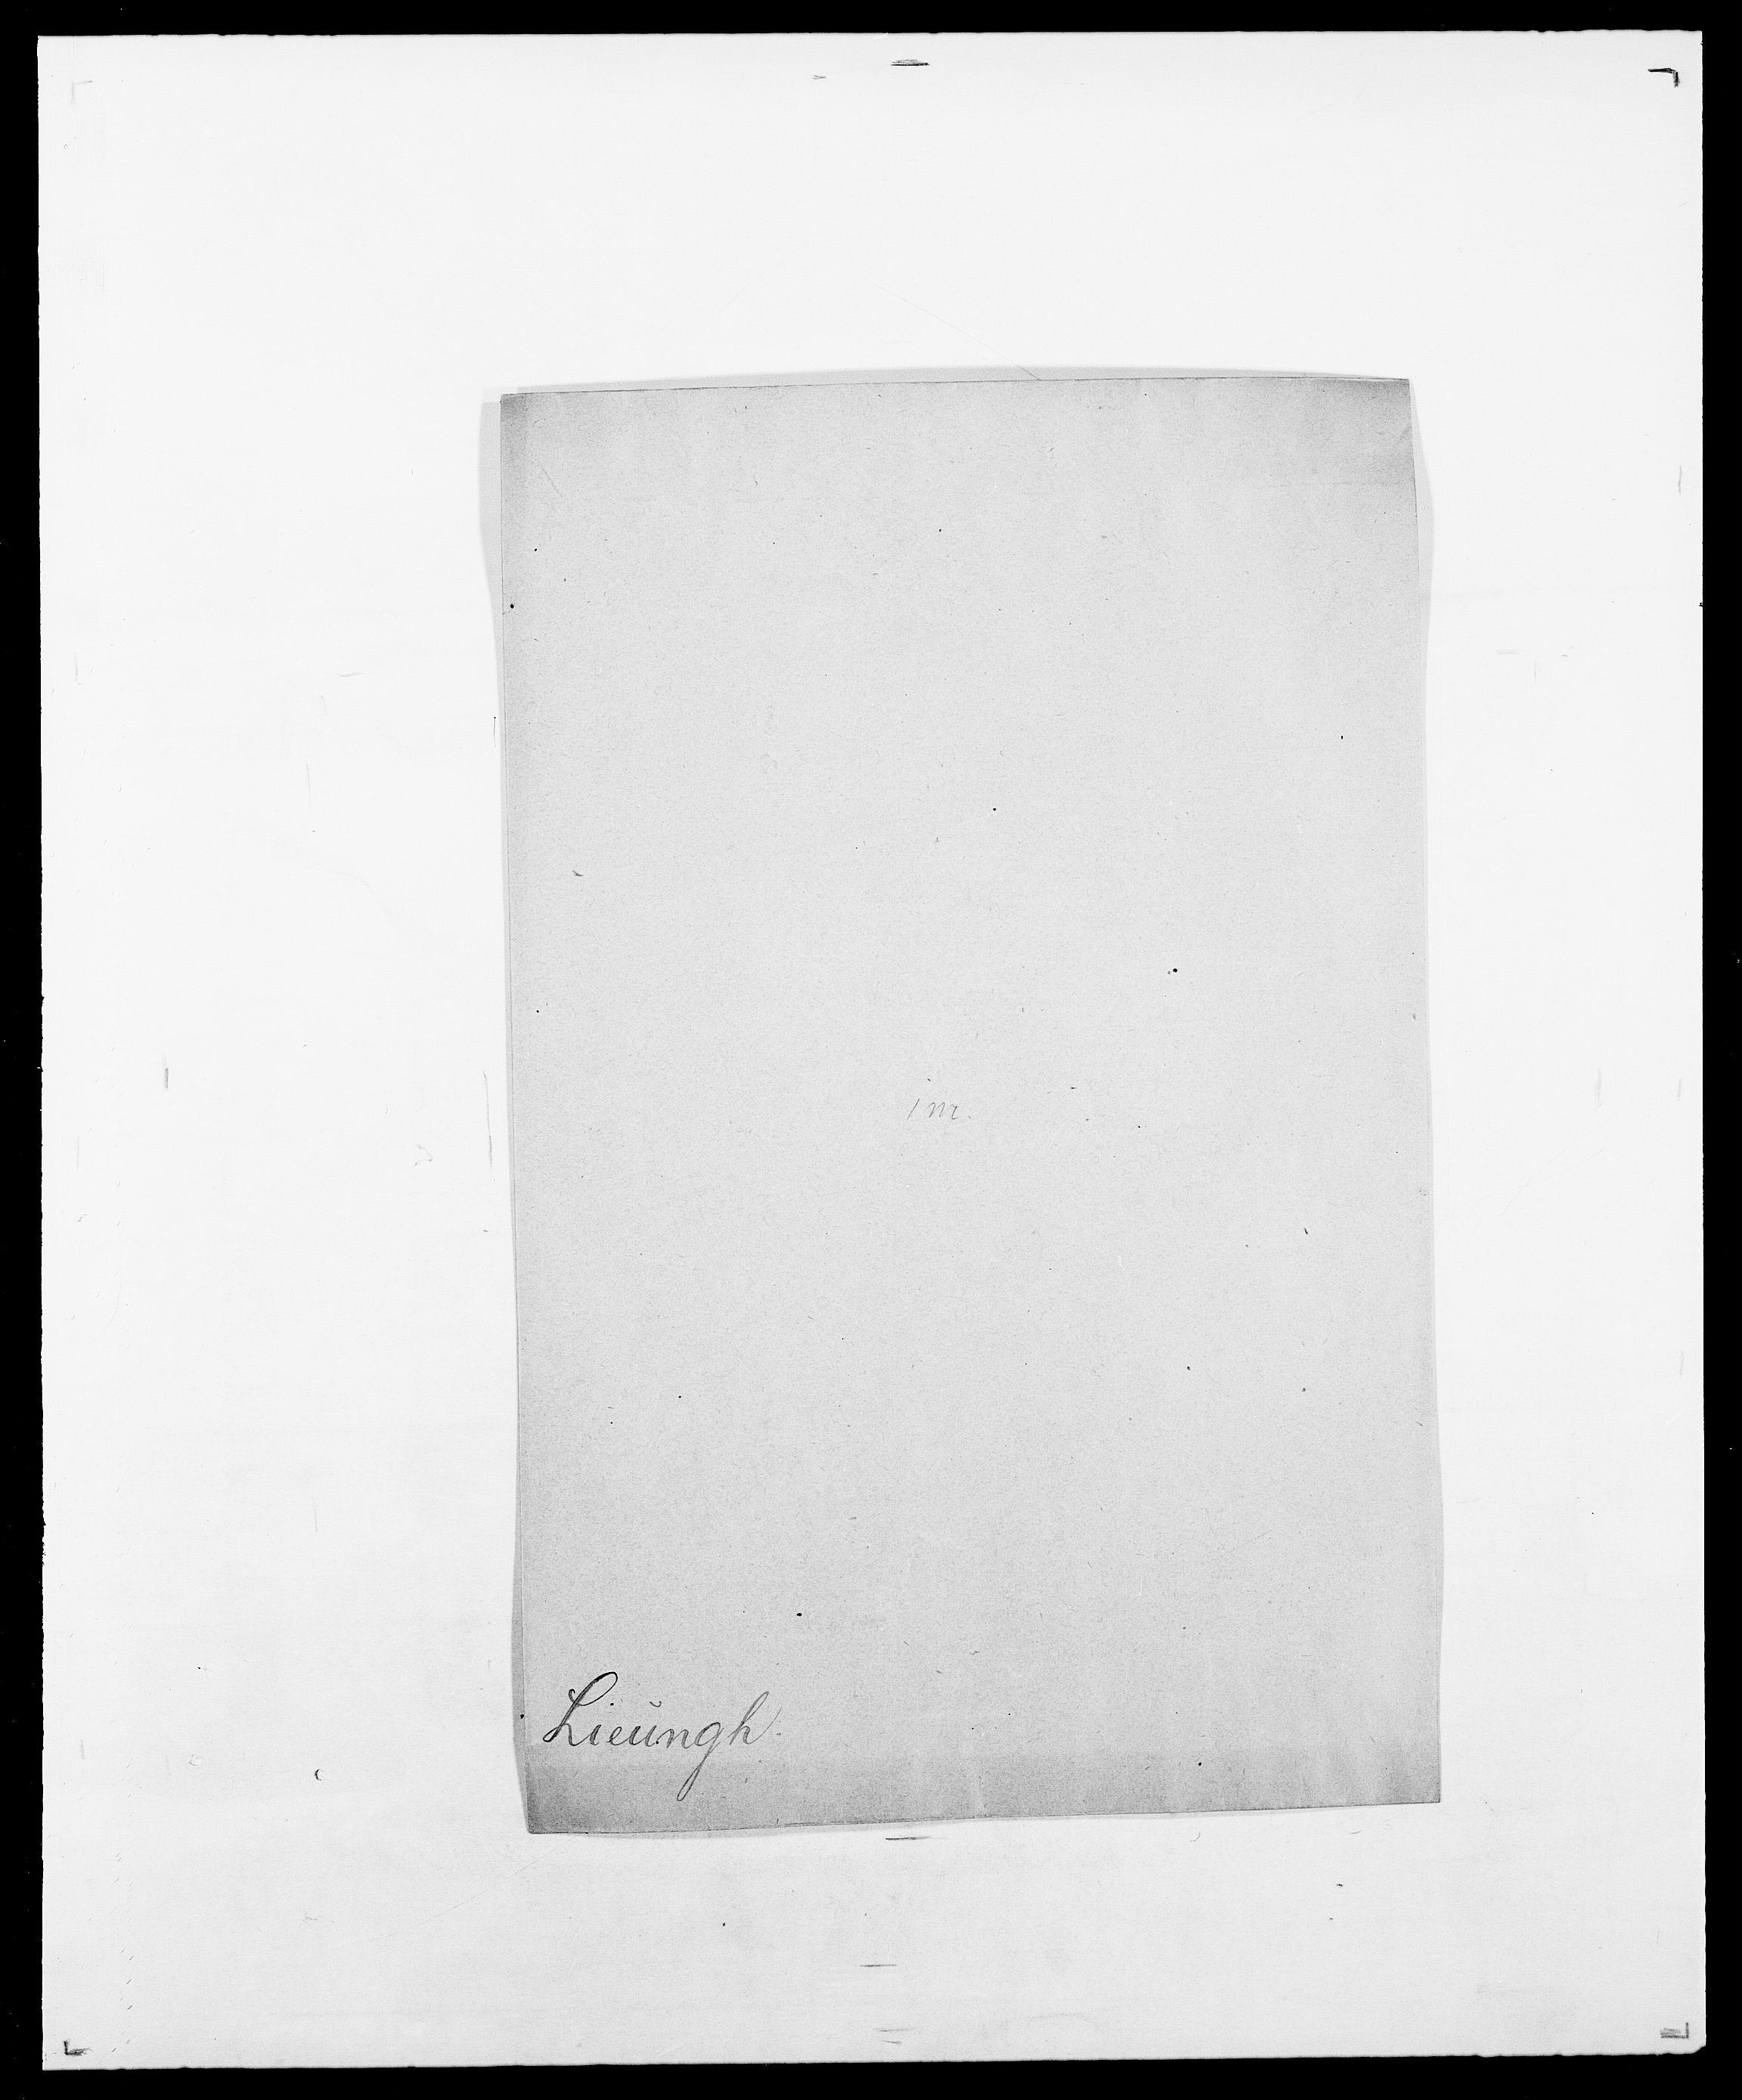 SAO, Delgobe, Charles Antoine - samling, D/Da/L0023: Lau - Lirvyn, s. 374